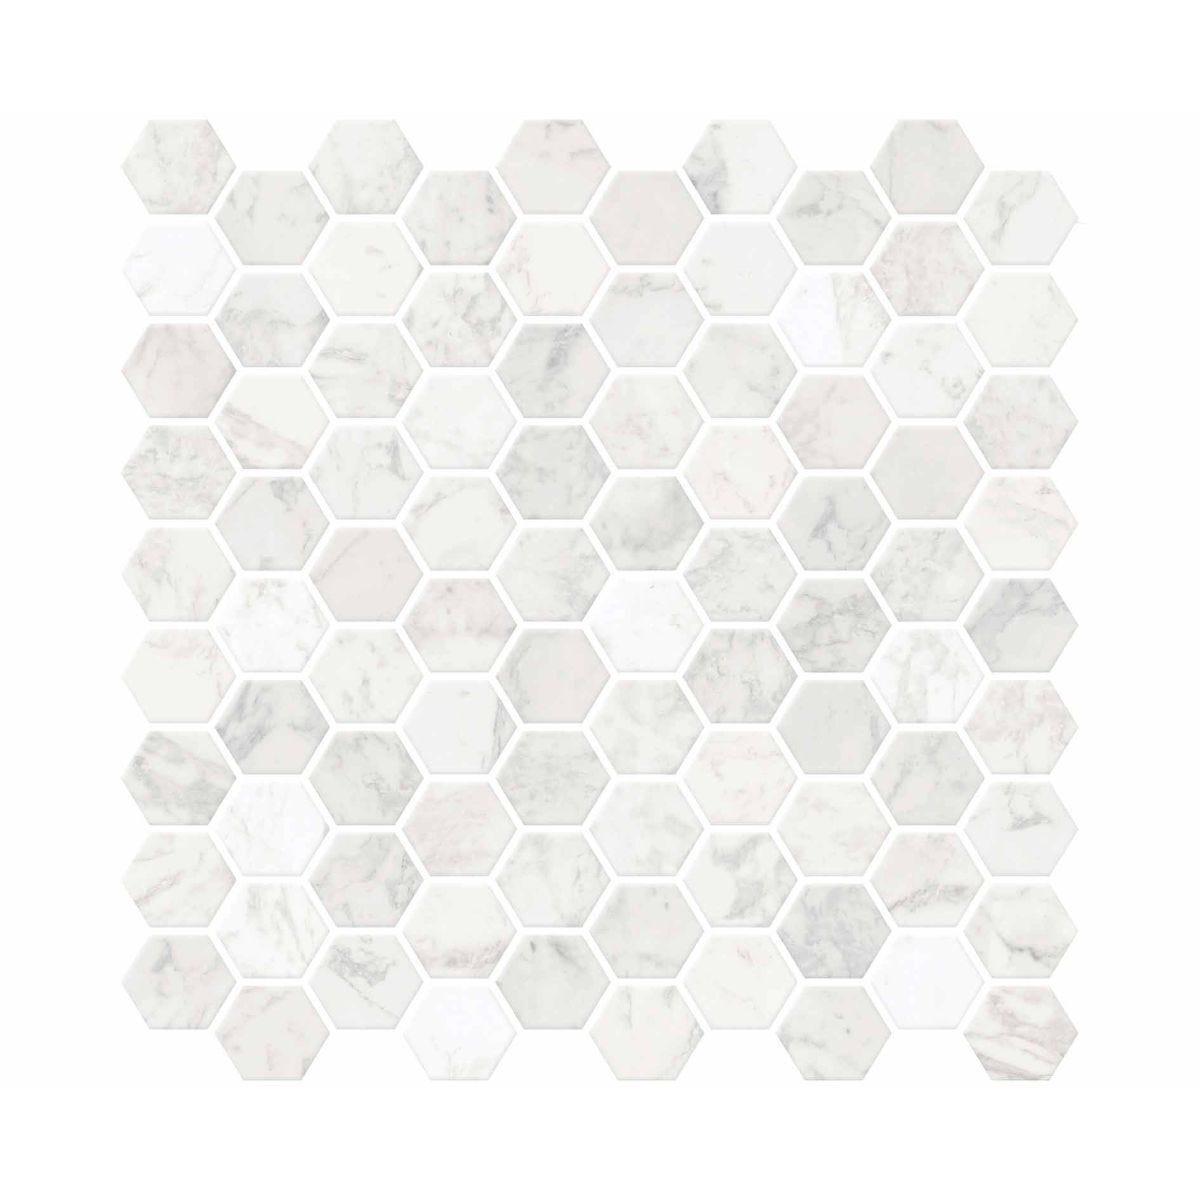 Hexagon Marble Backsplash Tiles Wall Decor